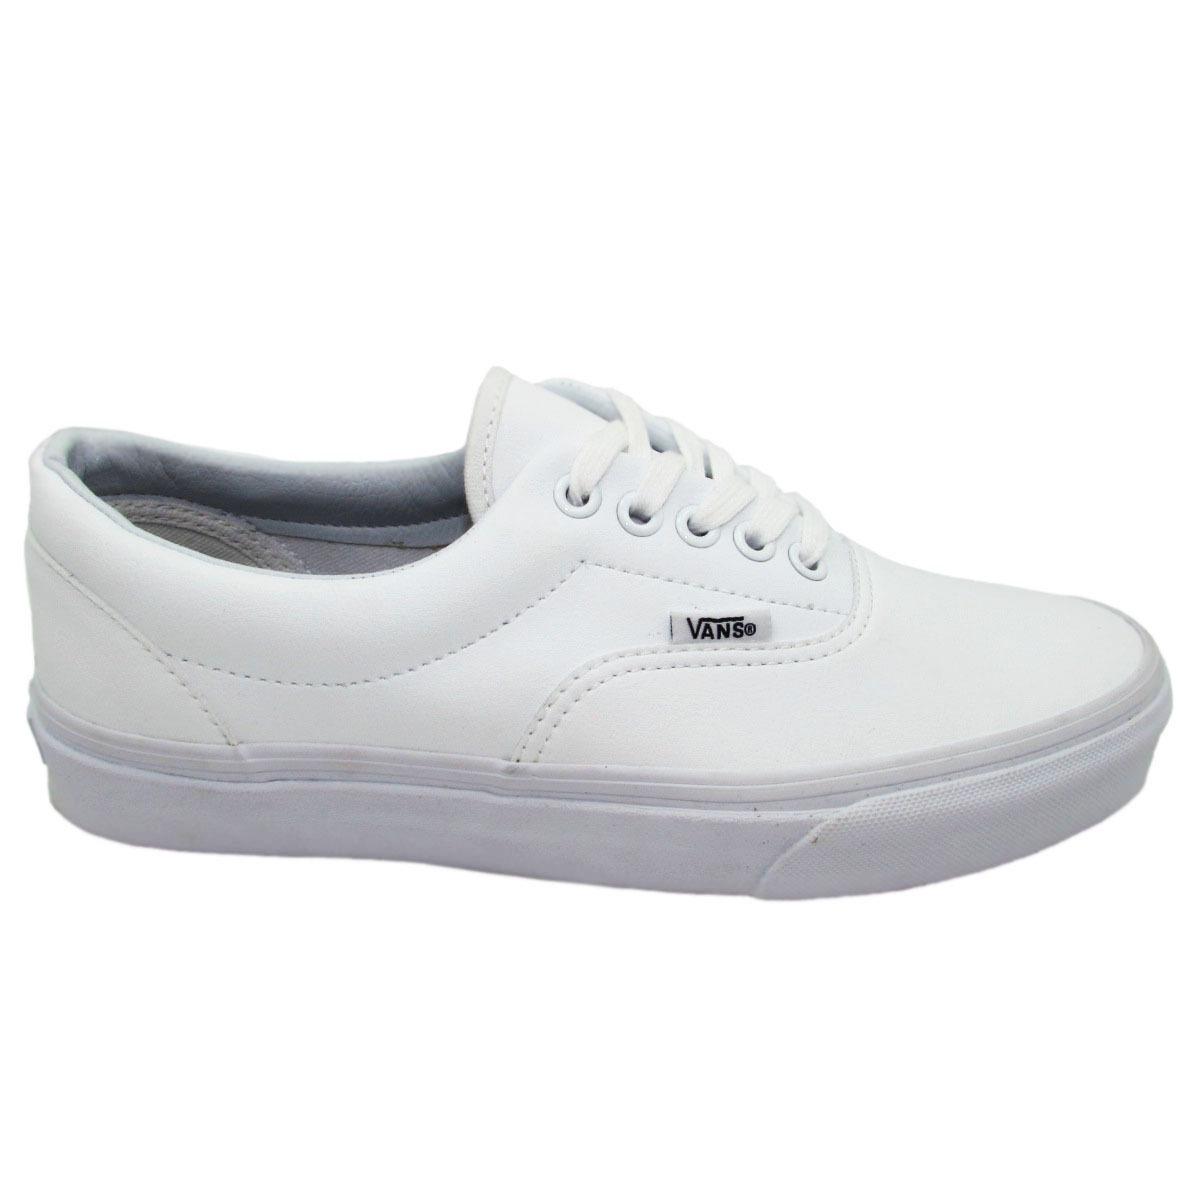 0c7ab0776fe tenis vans era classic vn0a38frodj tumble white true white. Cargando zoom.